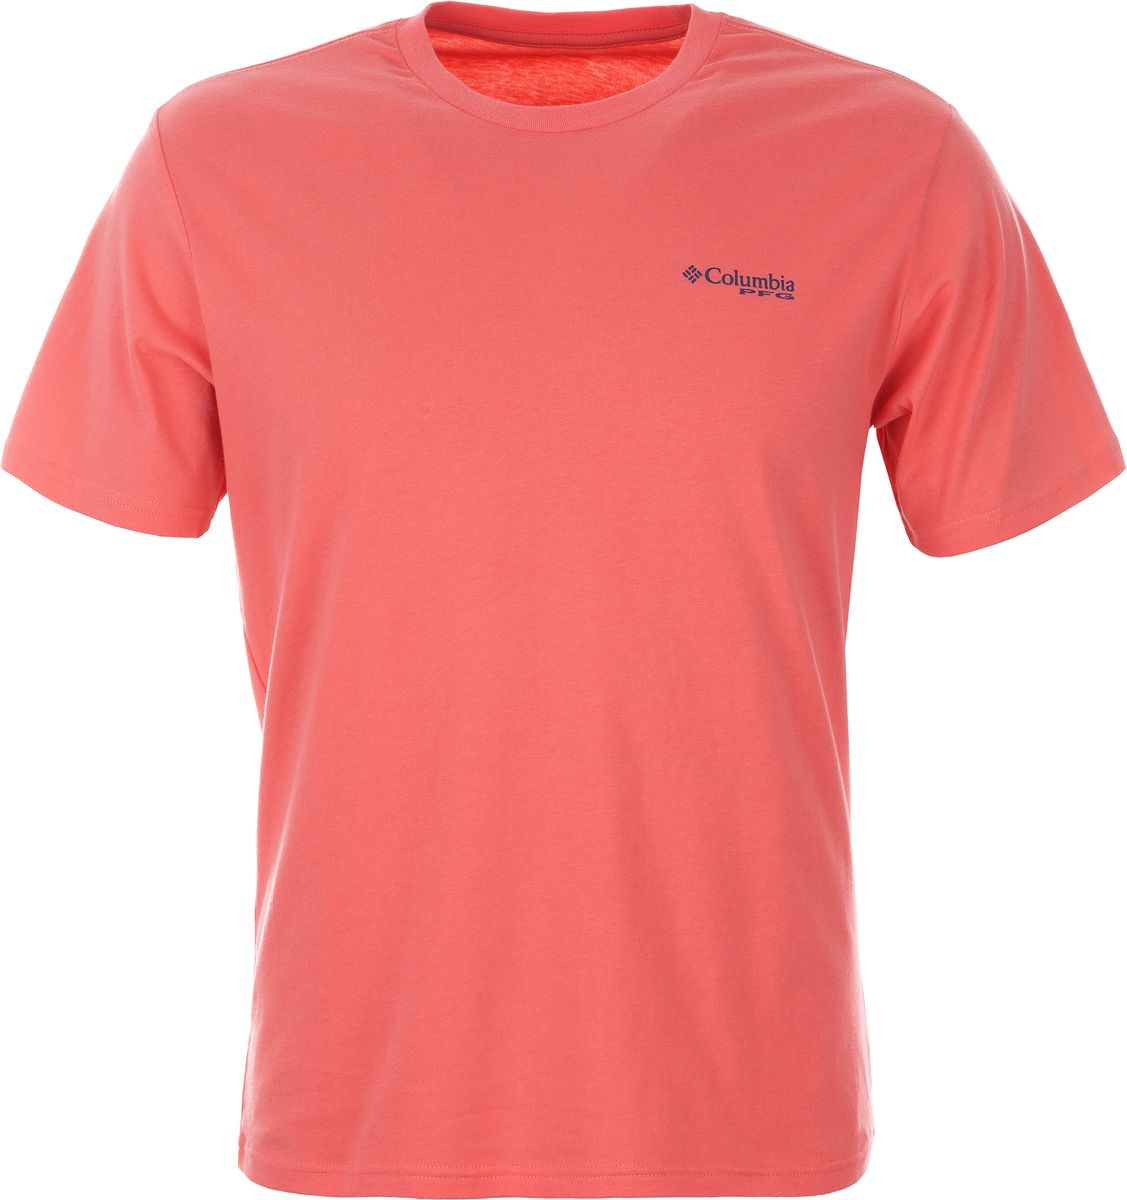 Футболка мужская Columbia PFG Triangle SS, цвет: розовый. 1717211-699. Размер XXL (56/58) быстросохнущая футболка columbia 0010 pfg heads and tails